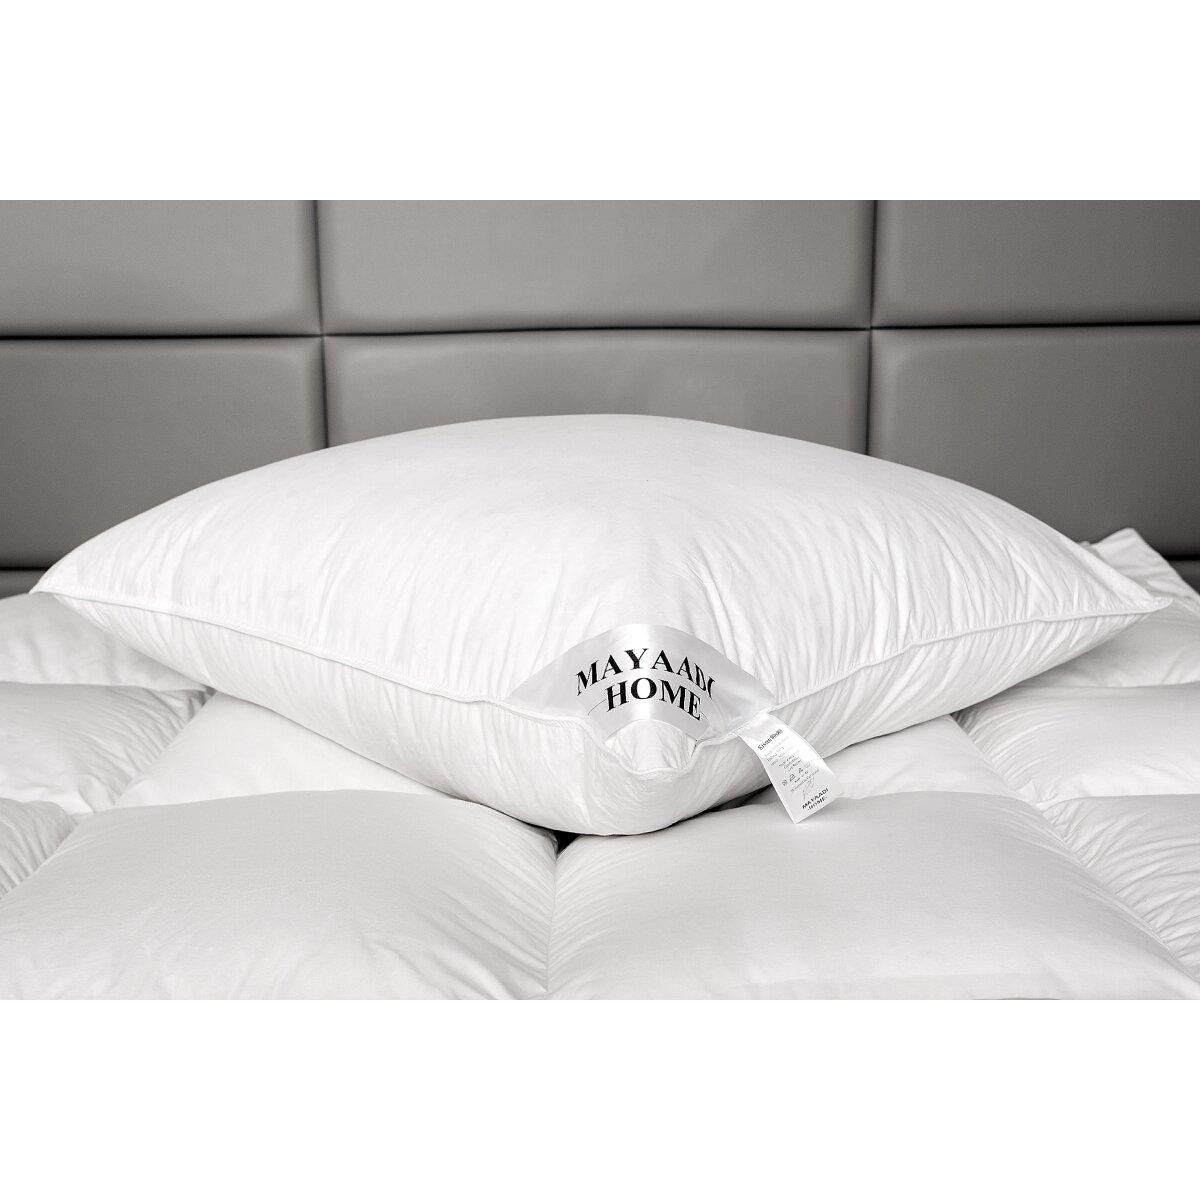 hs16 kissen 80x80 1400 200 g federn daunen 3 kammer. Black Bedroom Furniture Sets. Home Design Ideas